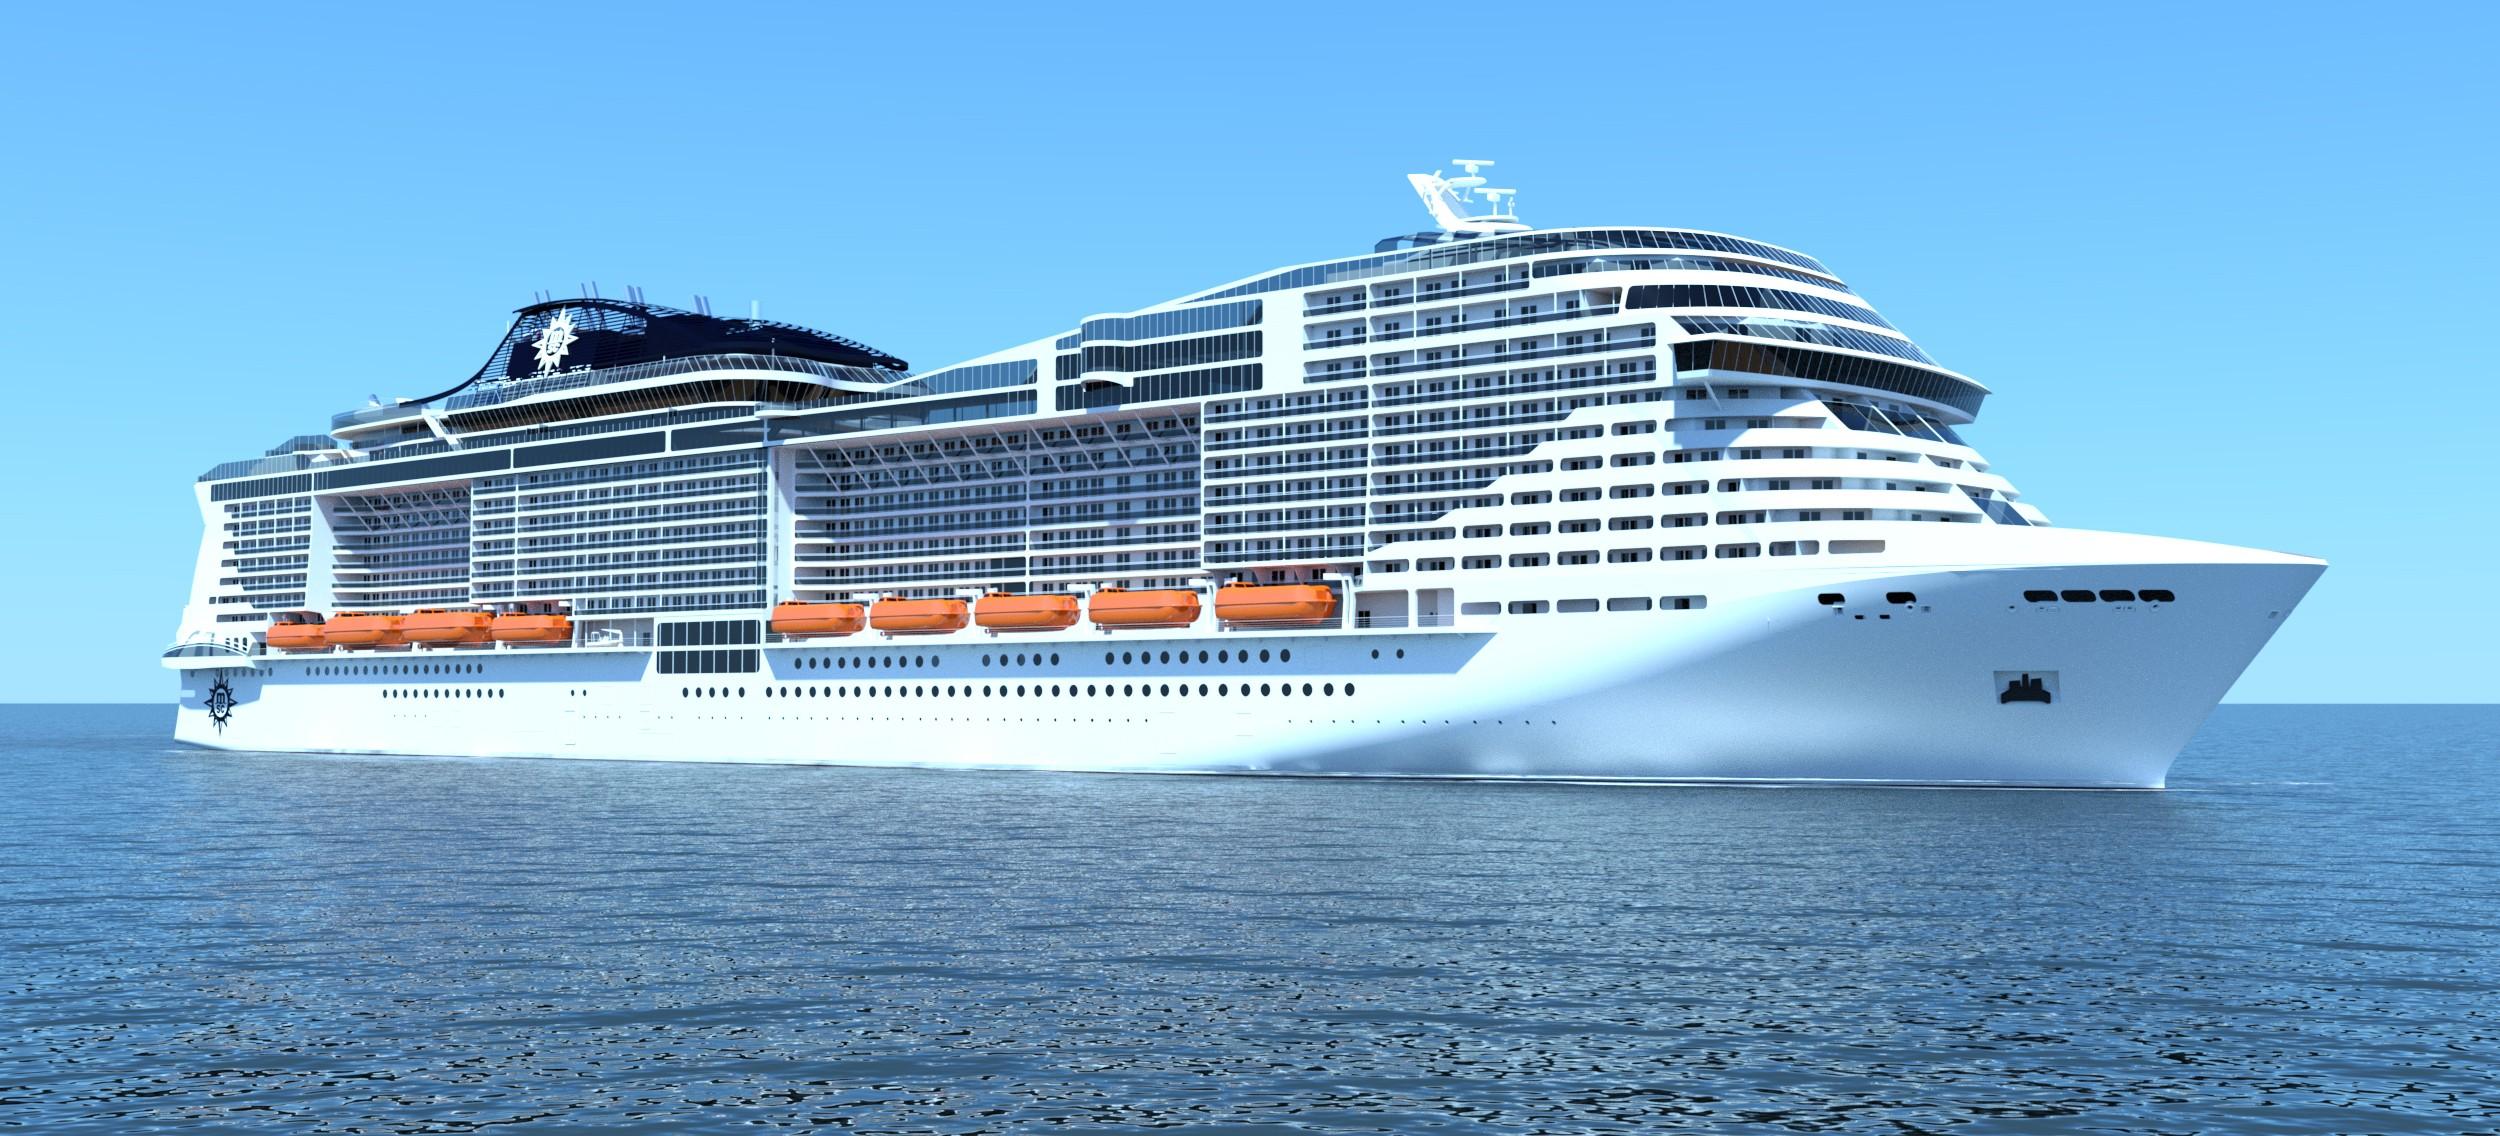 Analysis Amp Renderings Msc S Newbuild Program With Stx France And Fincantieri Cruiseind